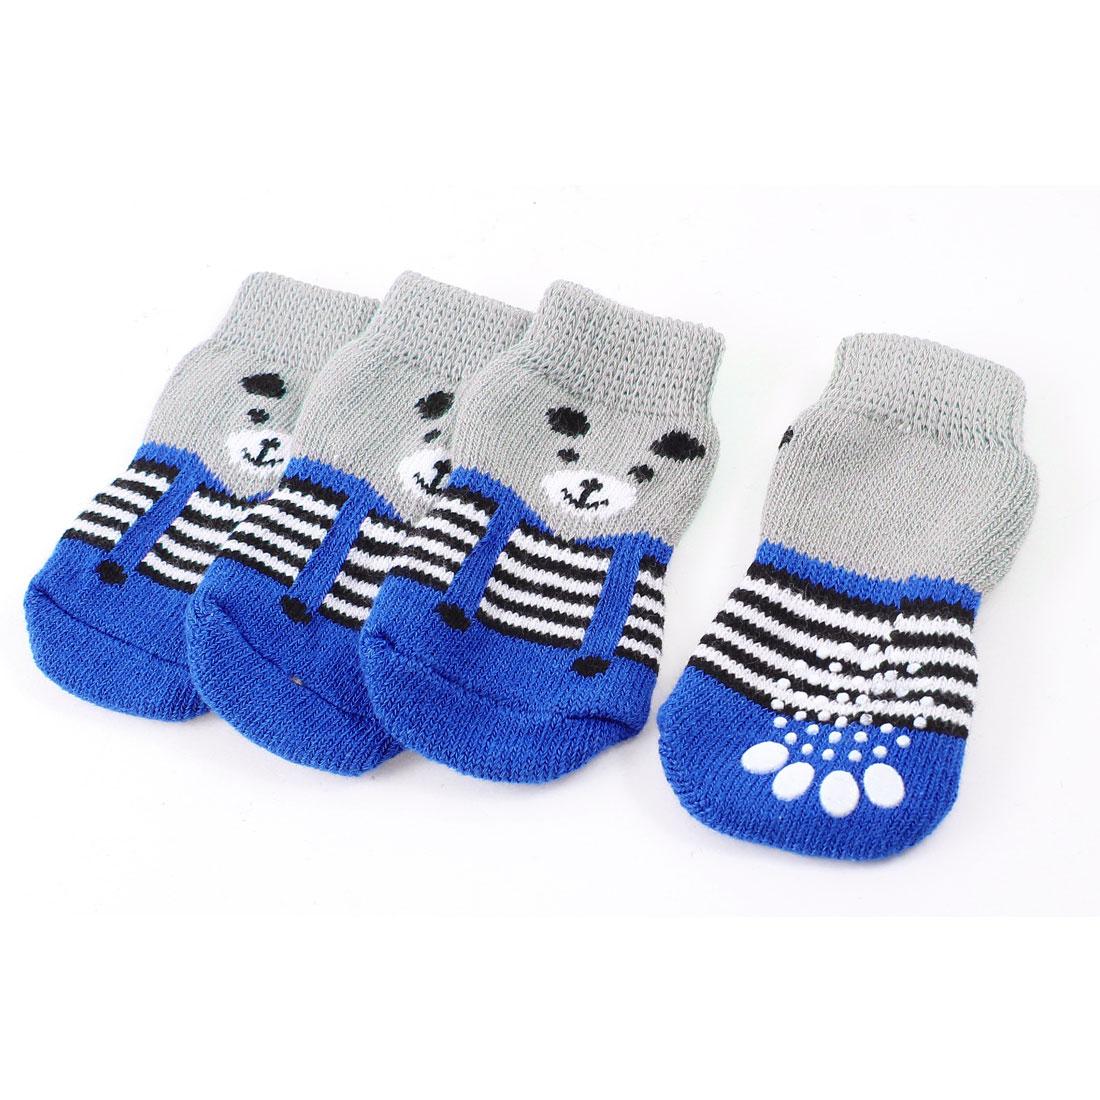 2 Pairs Gray Blue Bear Head Print Knitted Warm Pet Dog Maltese Socks L